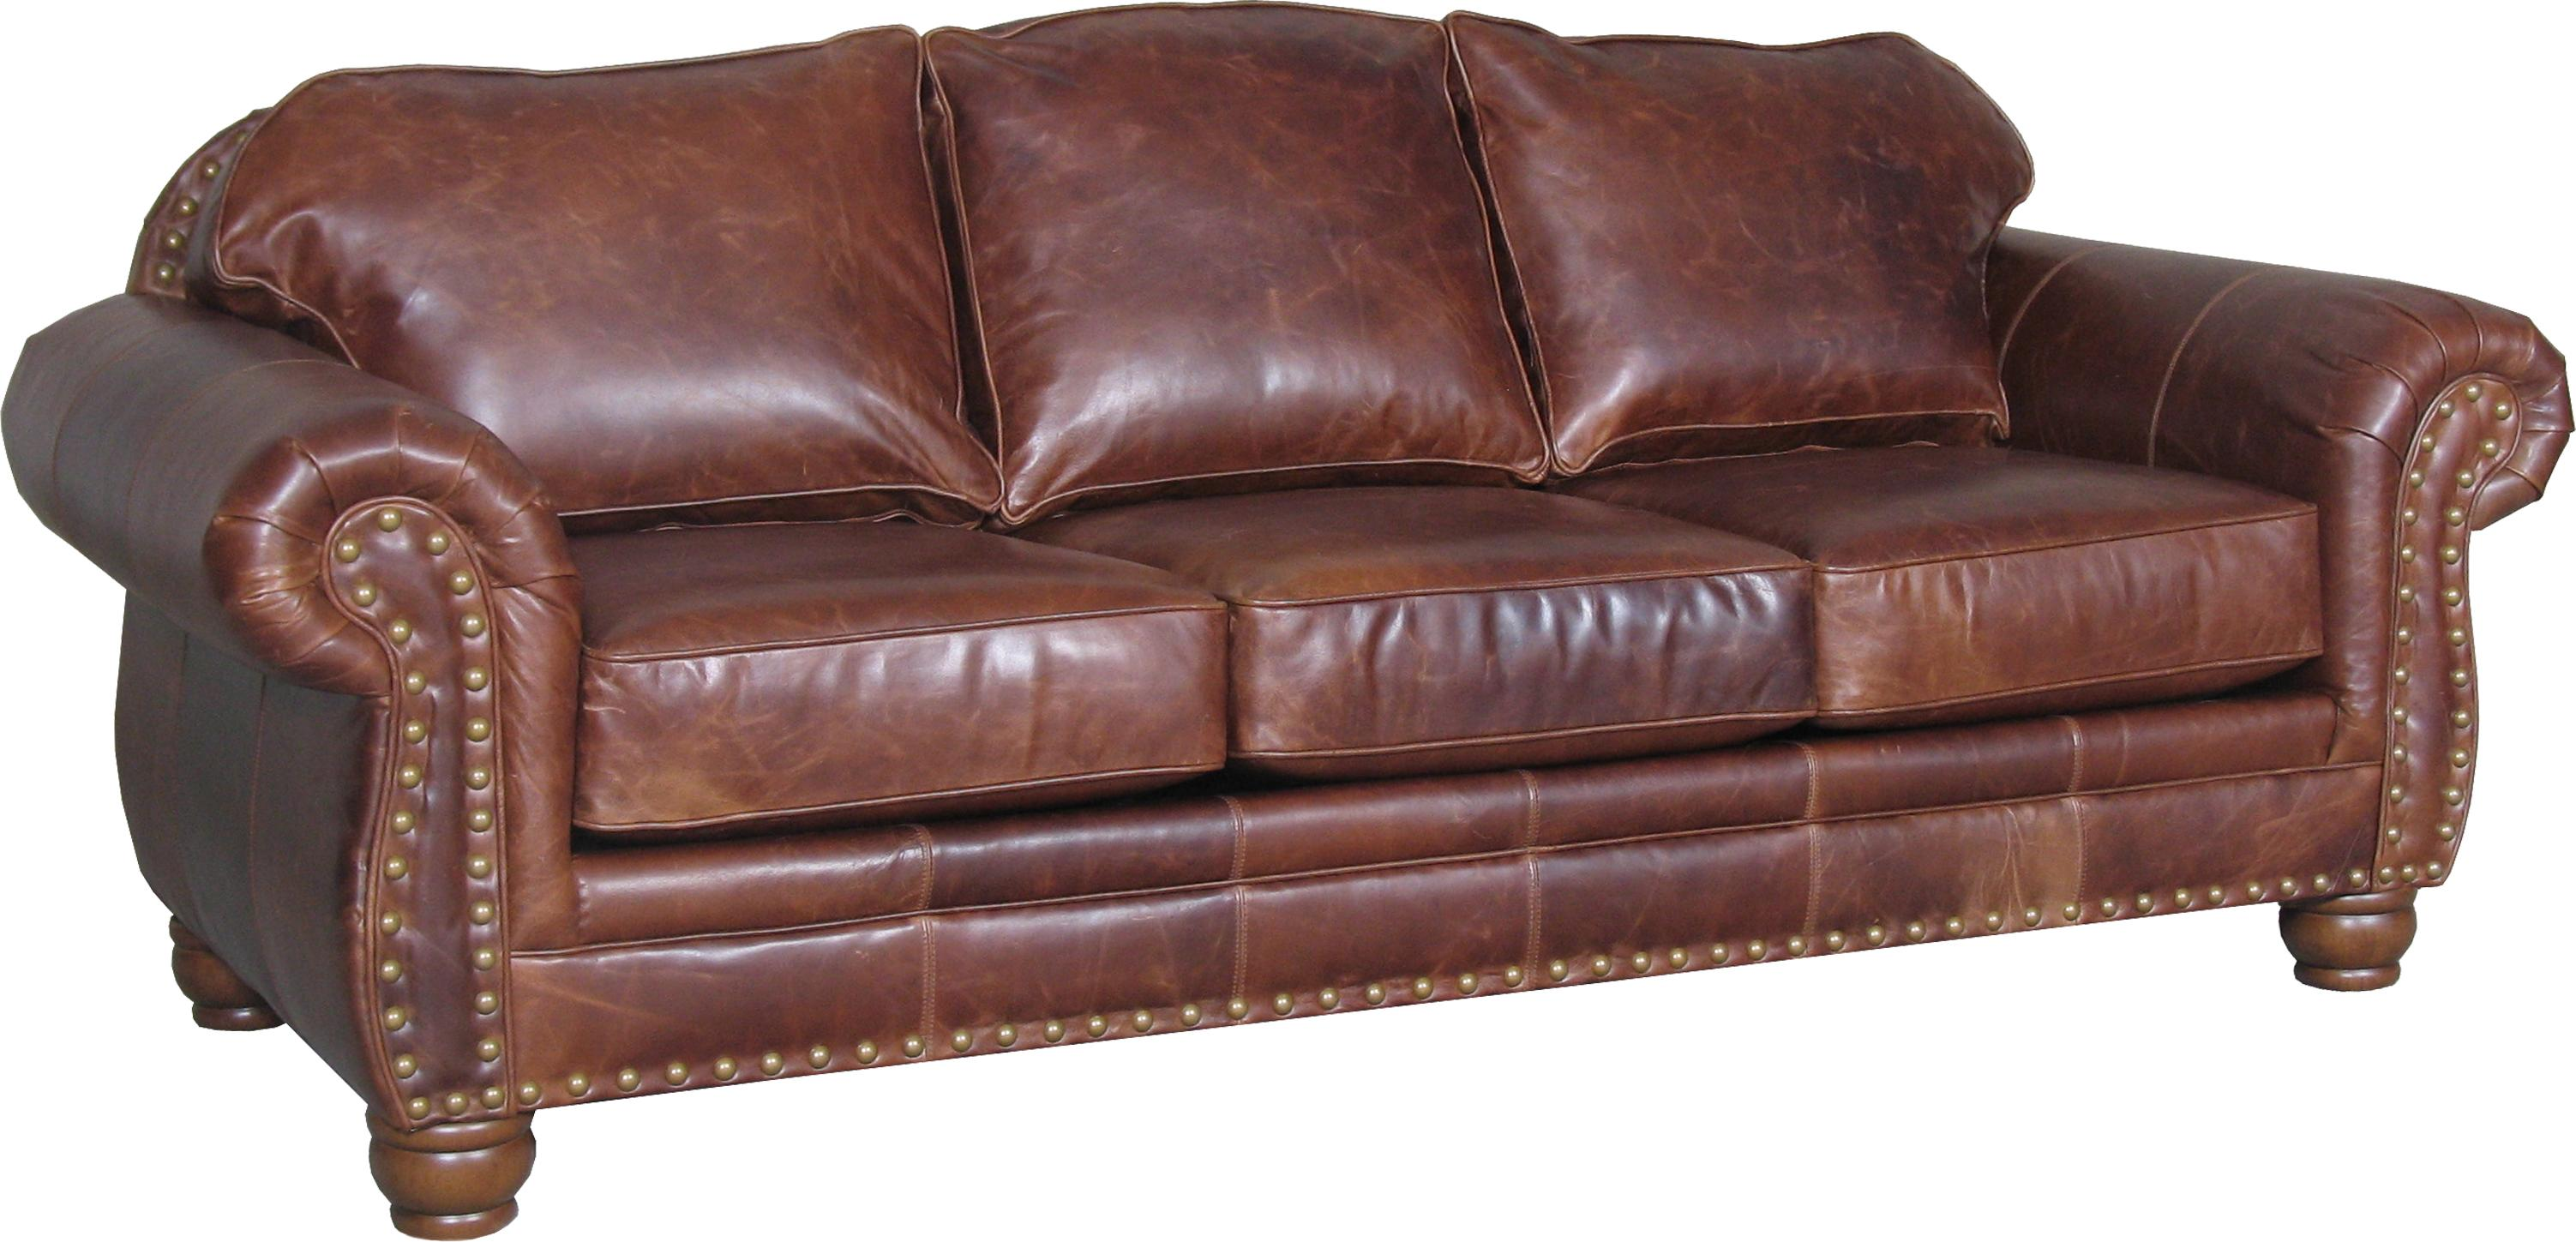 Mayo 318 Sofa - Item Number: 318010